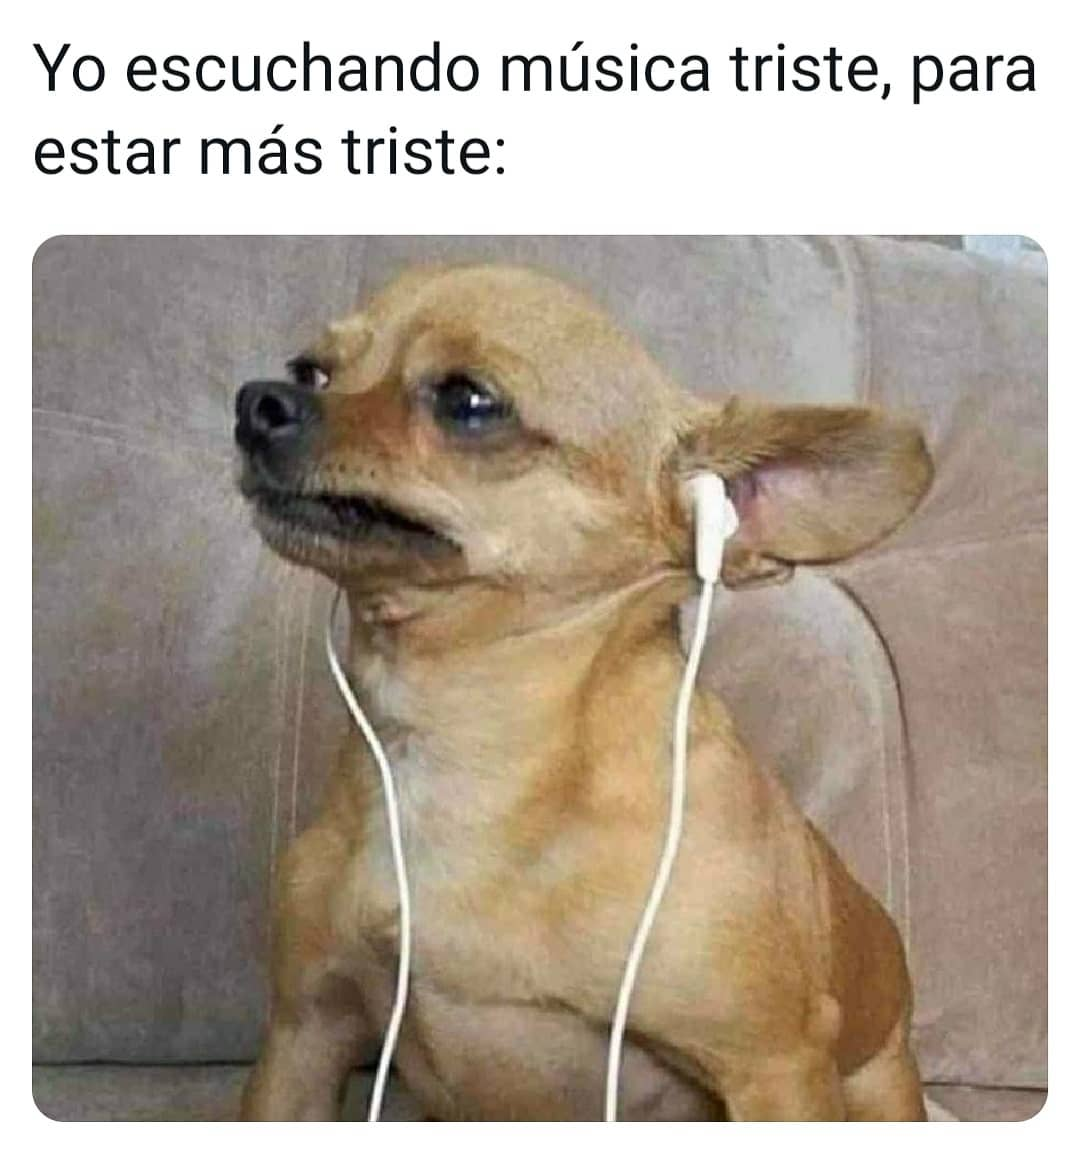 Yo escuchando música triste, para estar más triste: